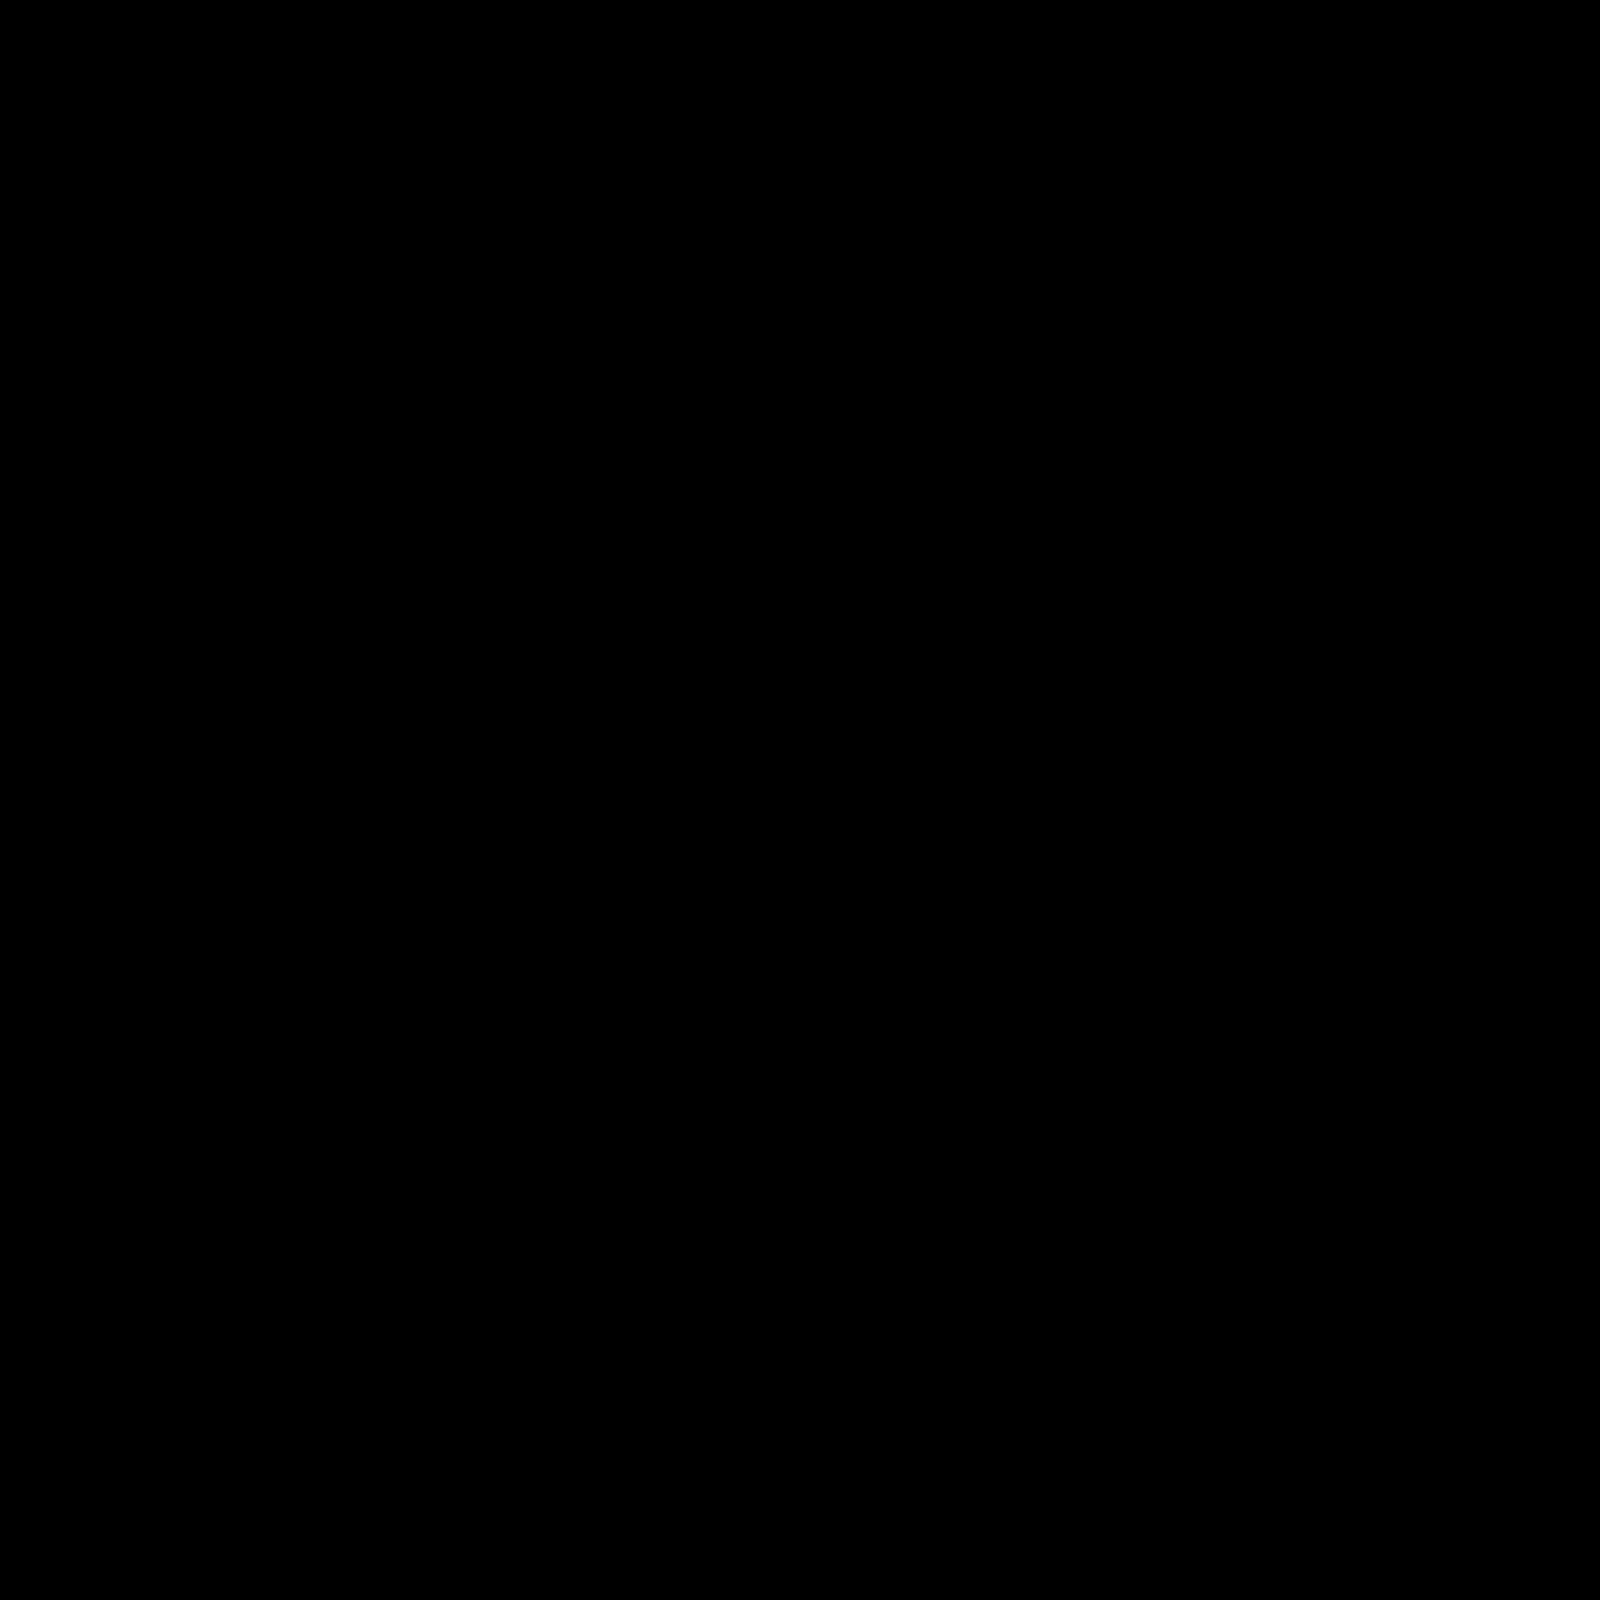 Camera Enhance icon